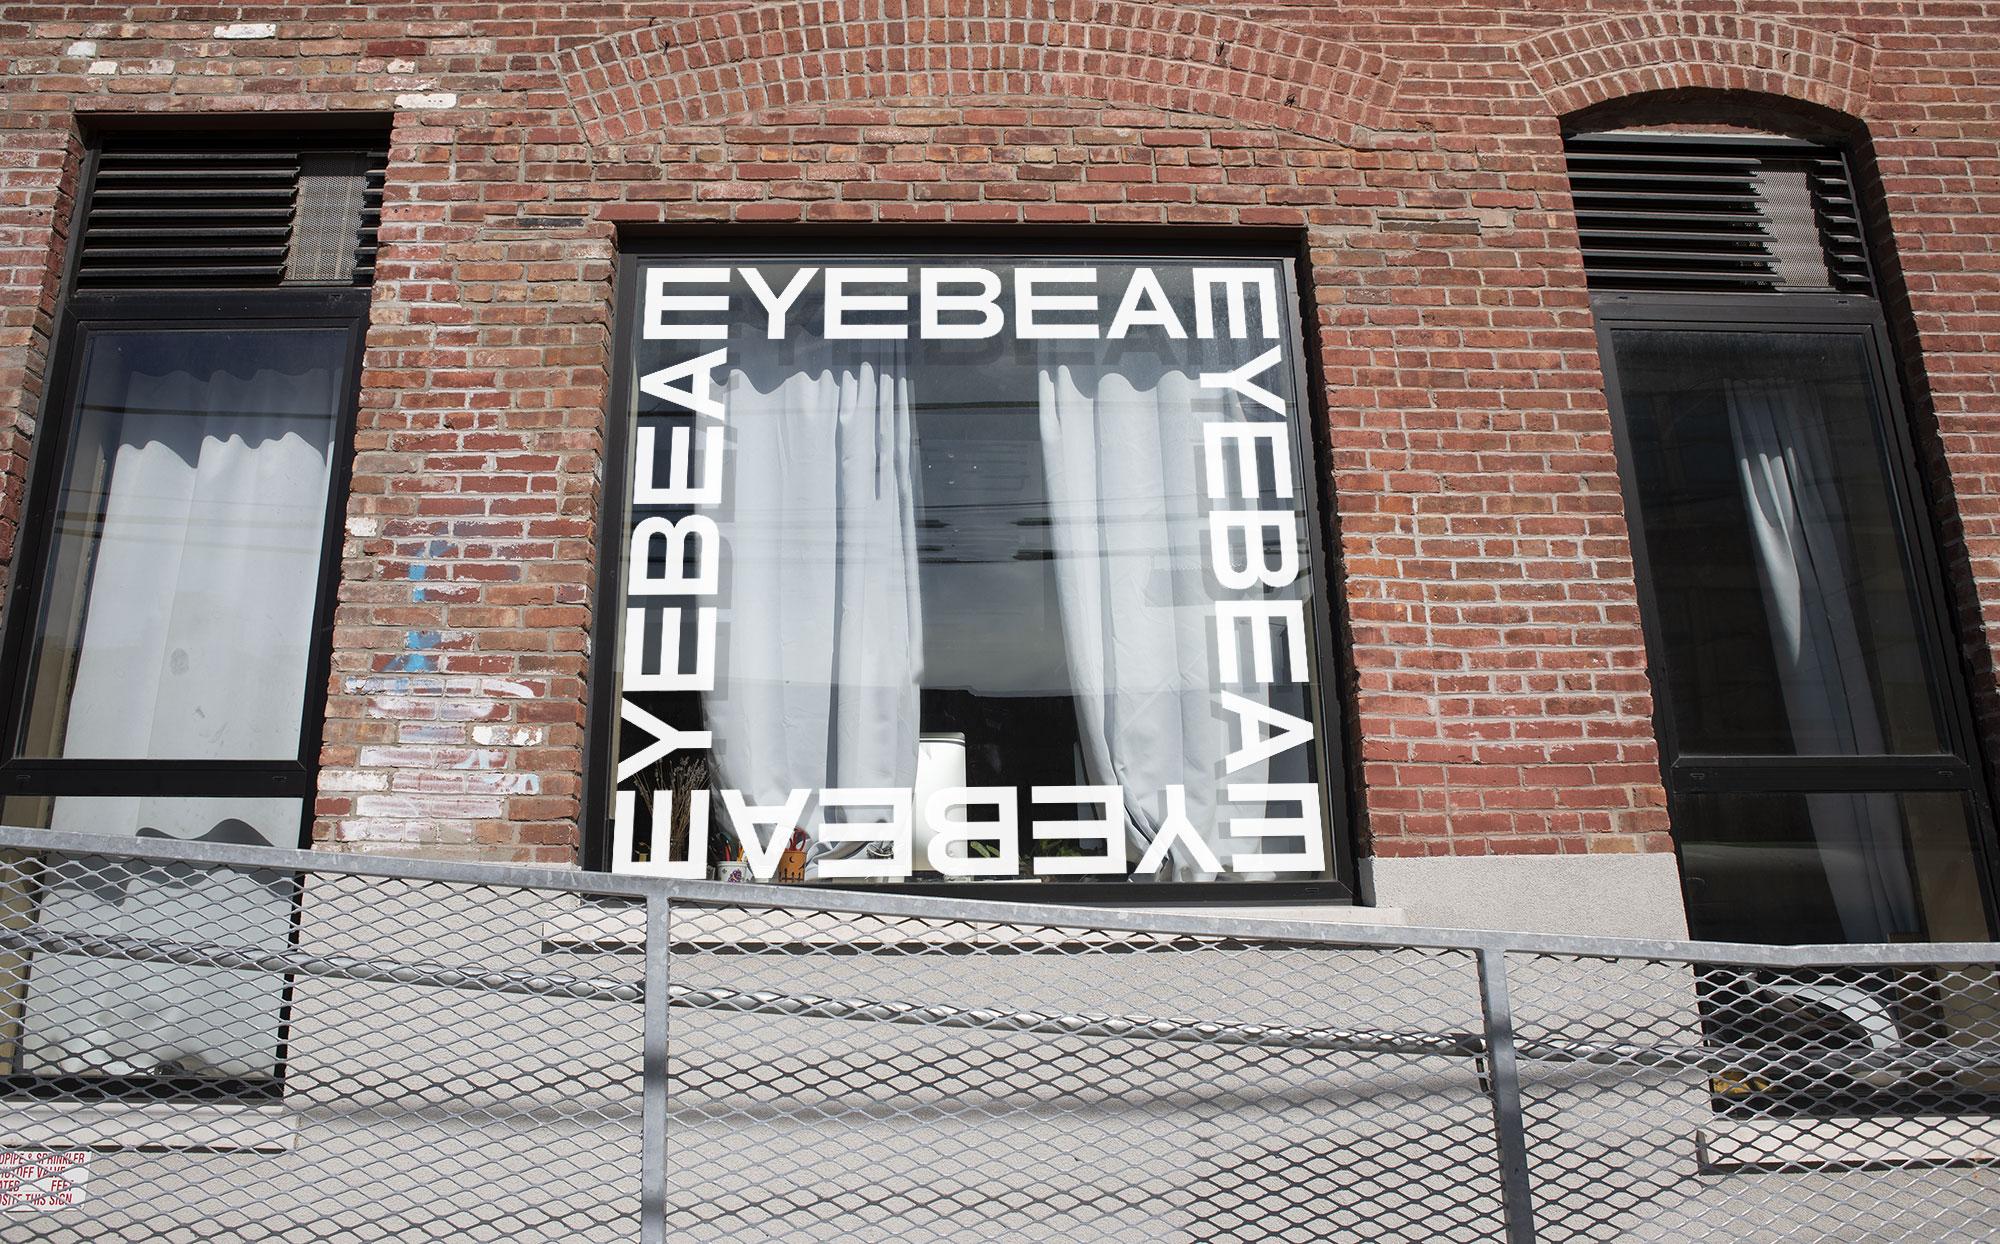 Eyebeam, Mother Design, Visual Identity, Logo, Yaya Xu, Matt van Leeuwen, Matthijs van Leeuwen